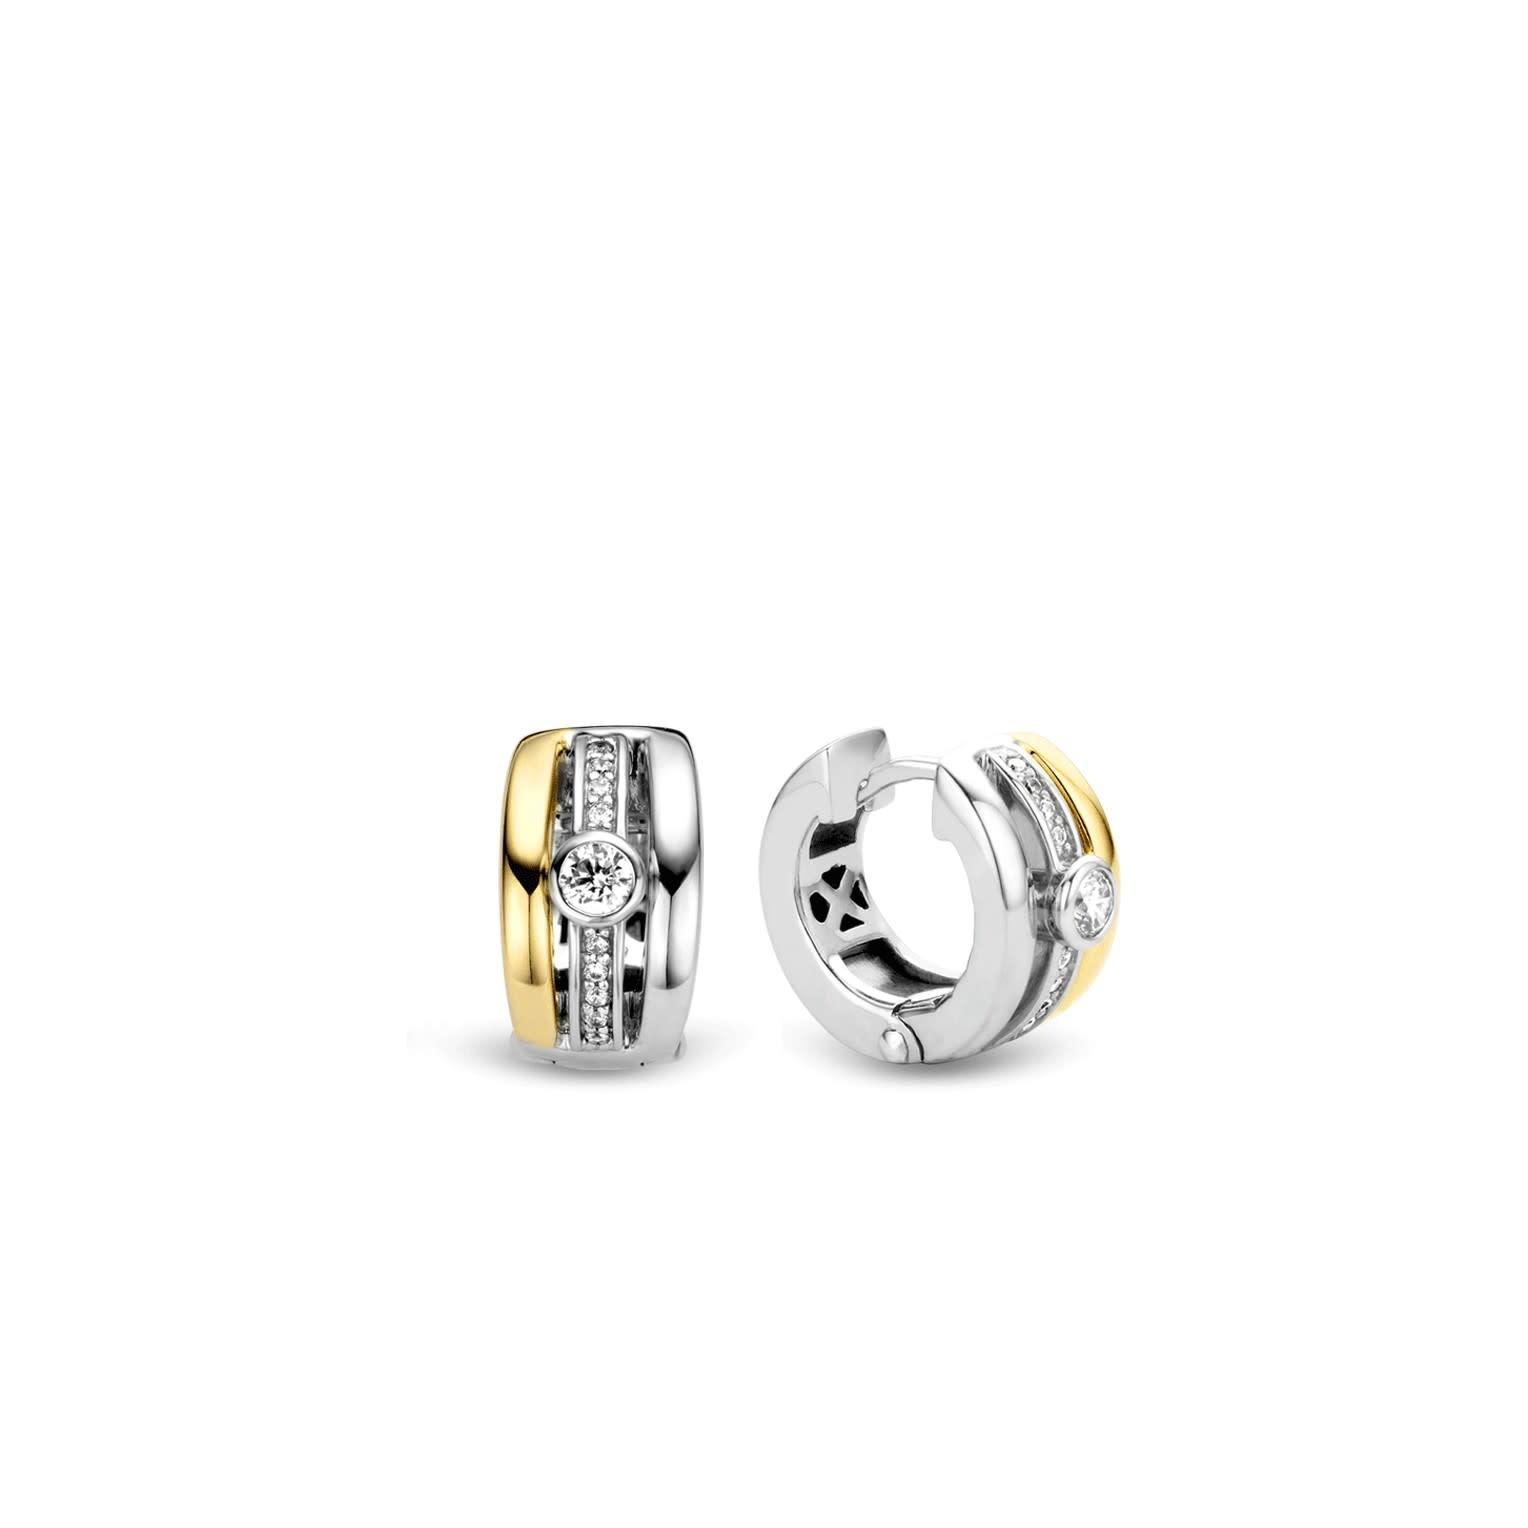 TI SENTO - Milano Earrings 7754ZY-1